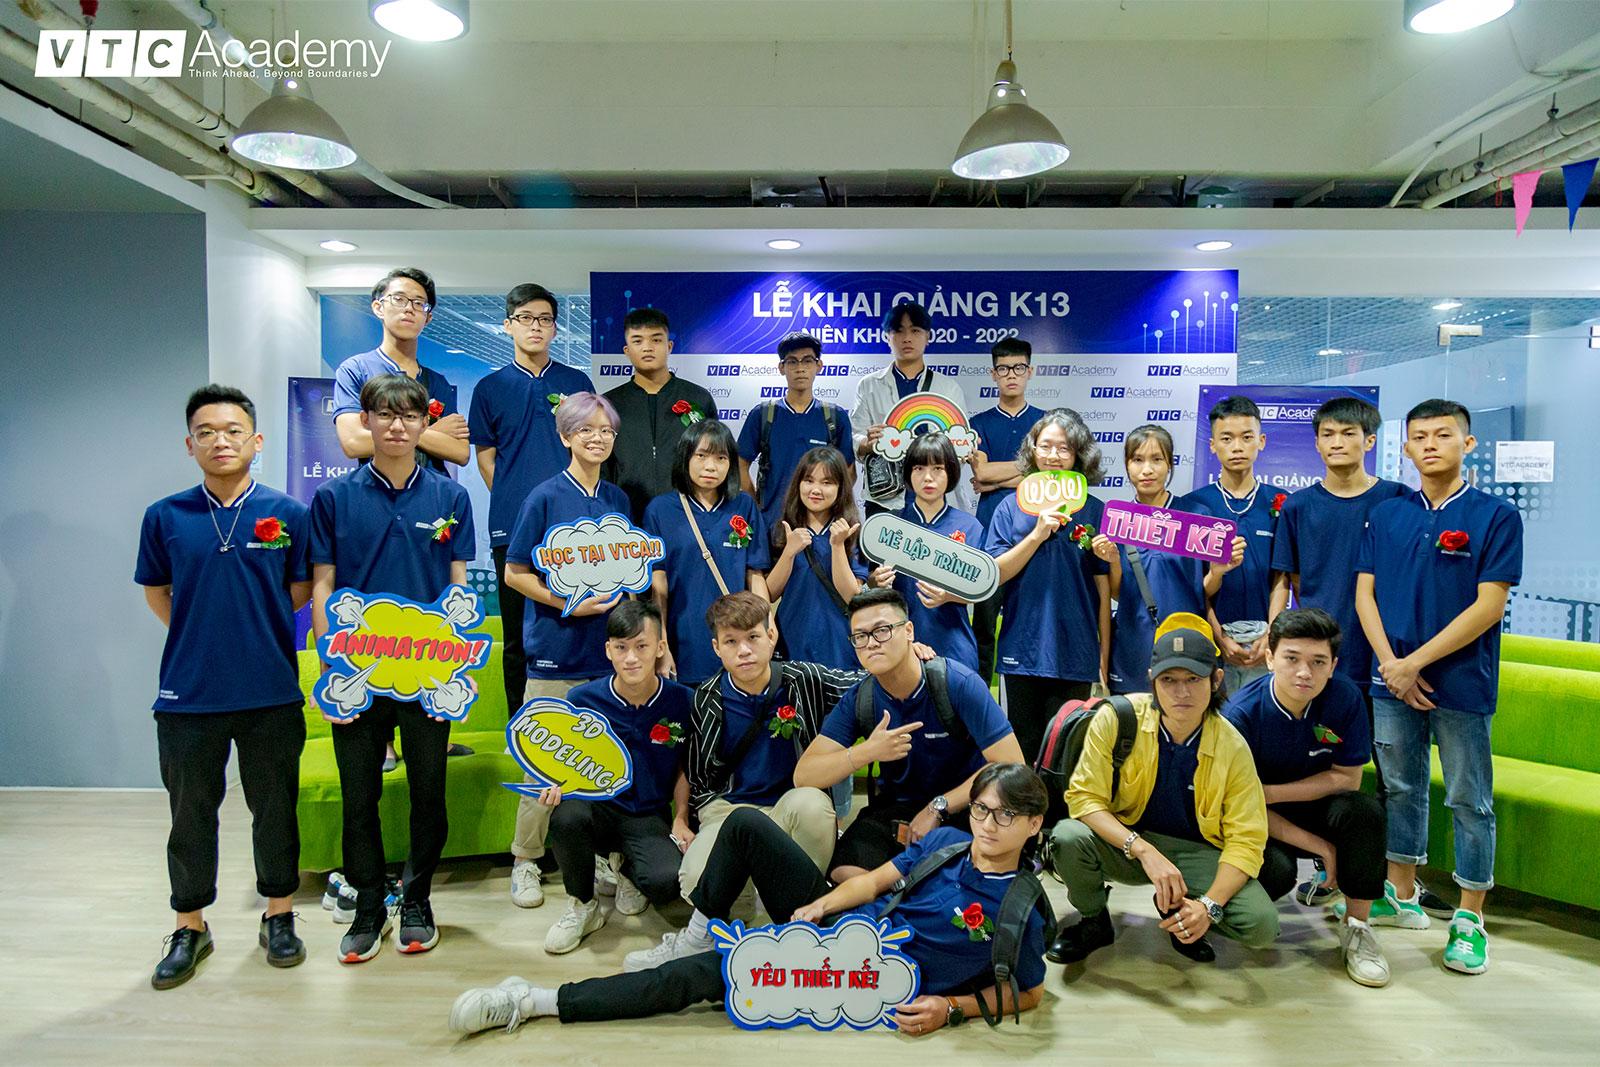 ngay-nhap-hoc-vtc-academy-2